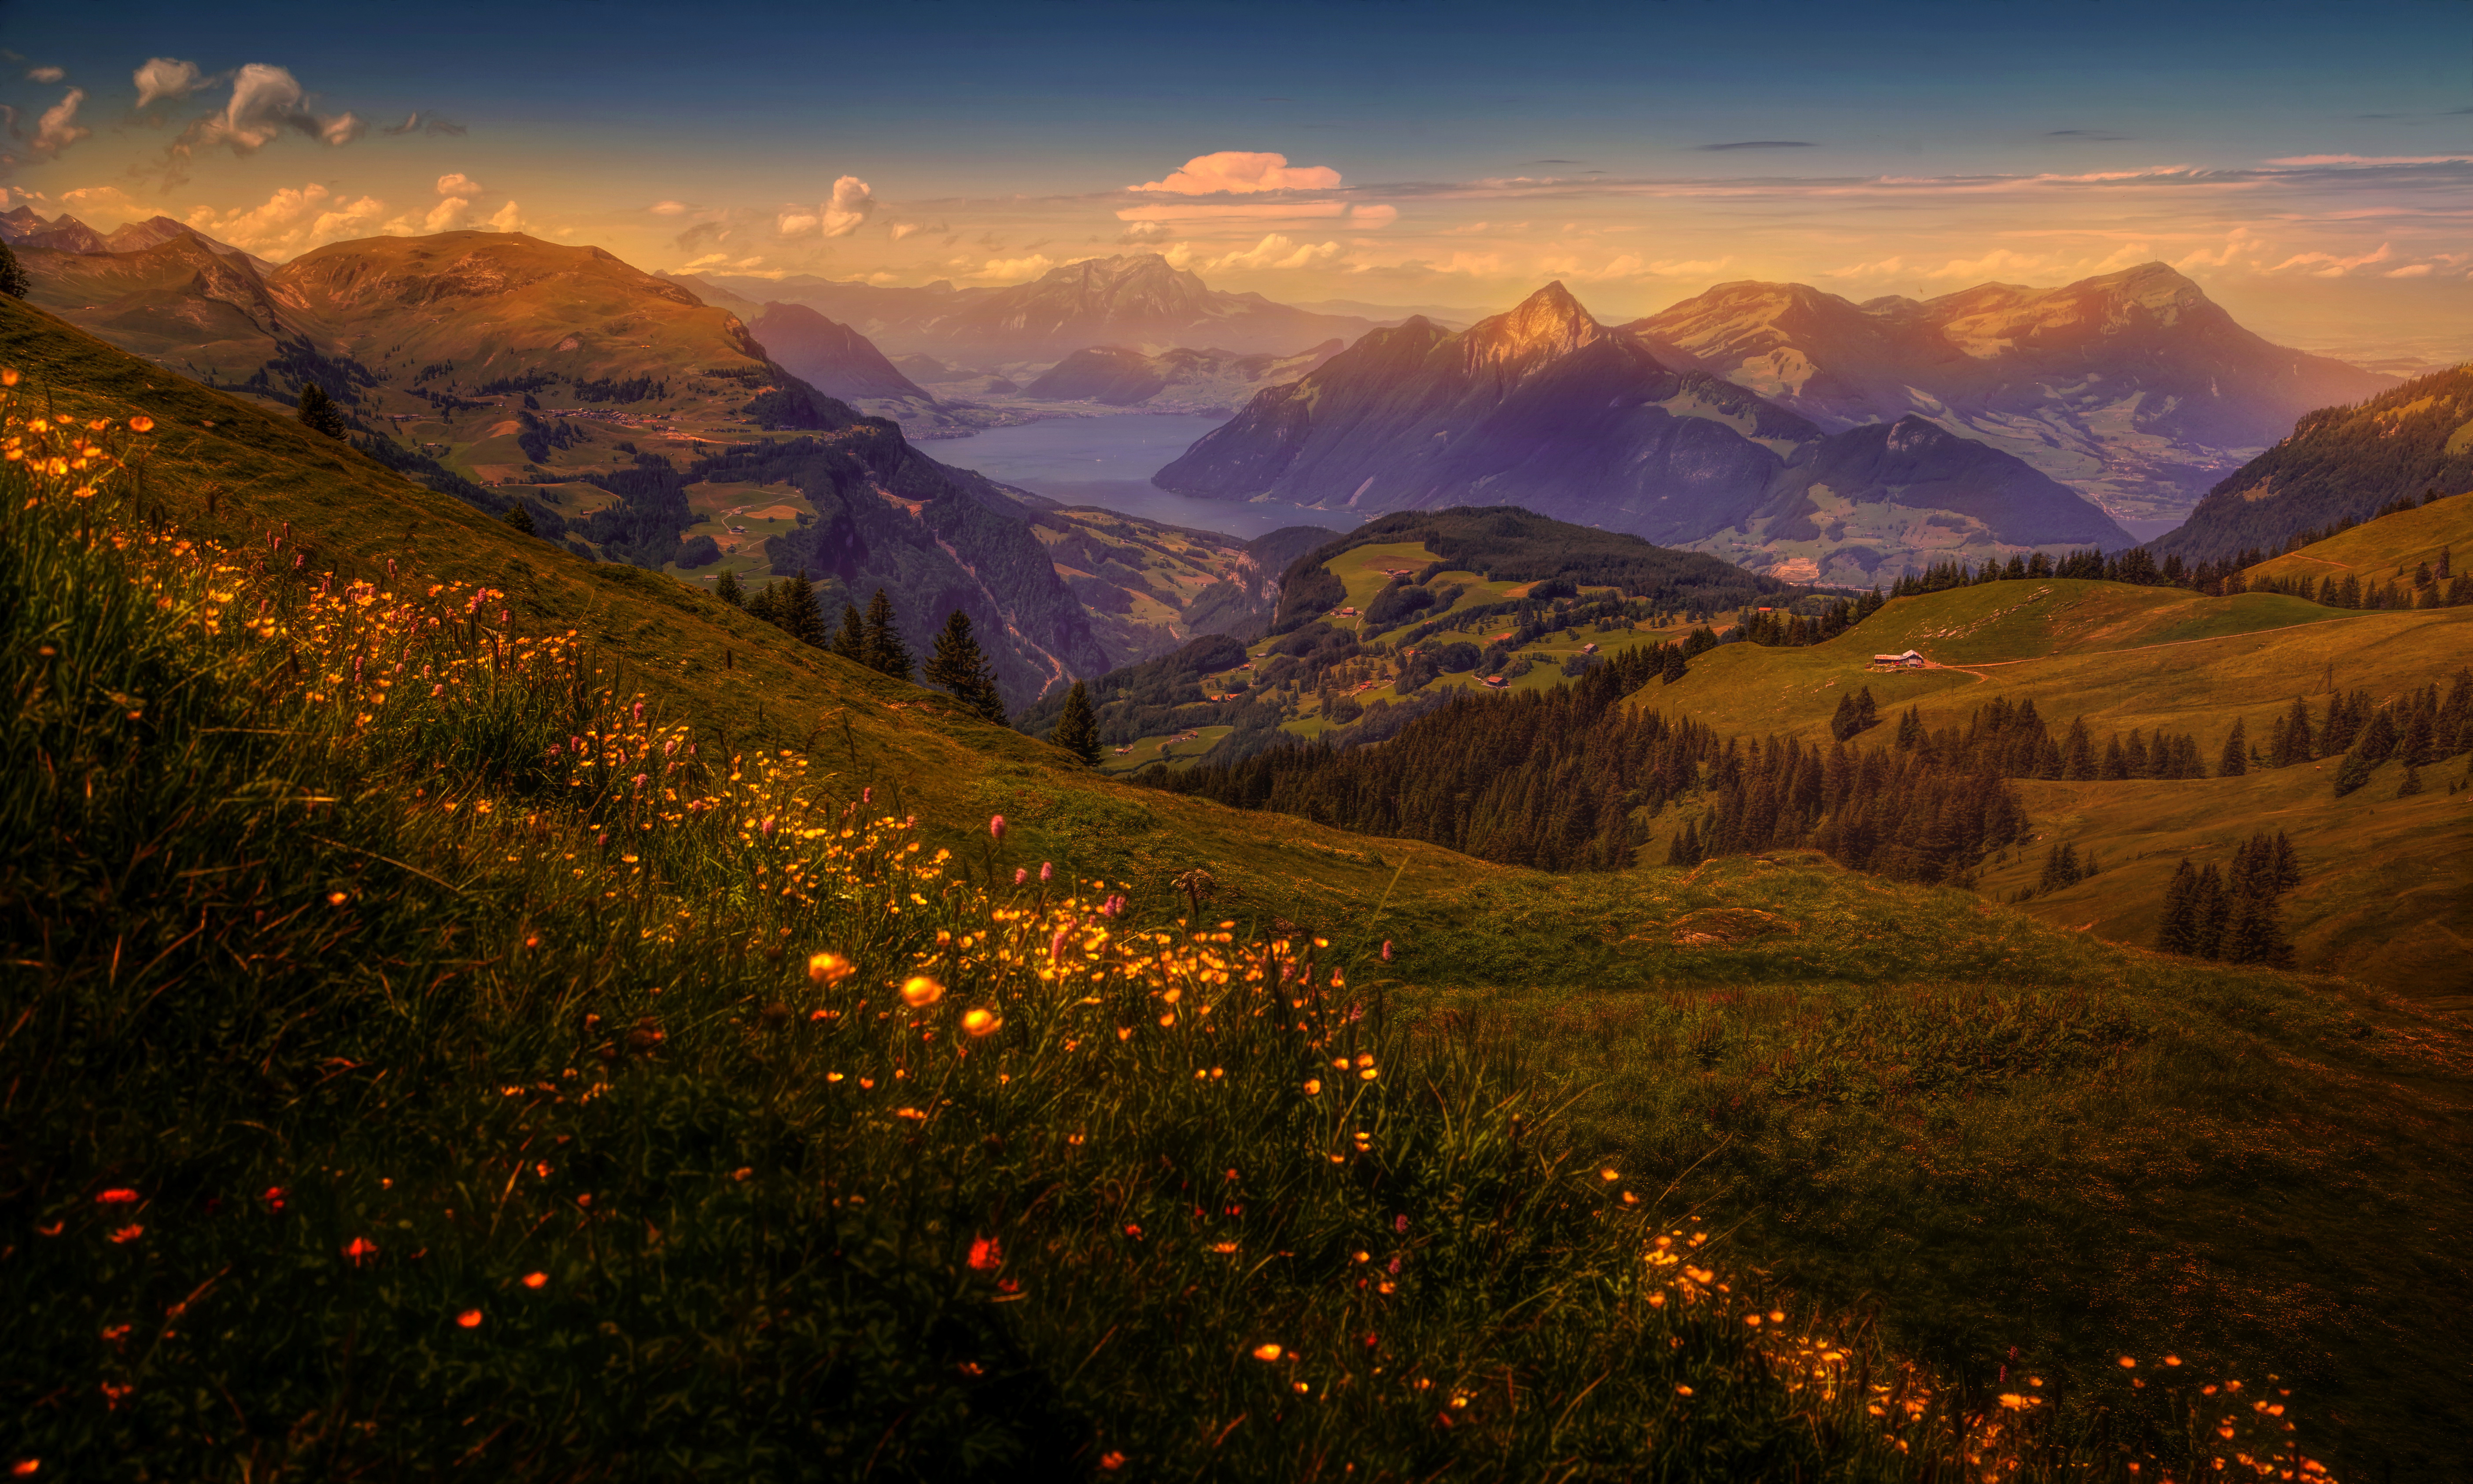 закат склон sunset the slope  № 1569350 бесплатно